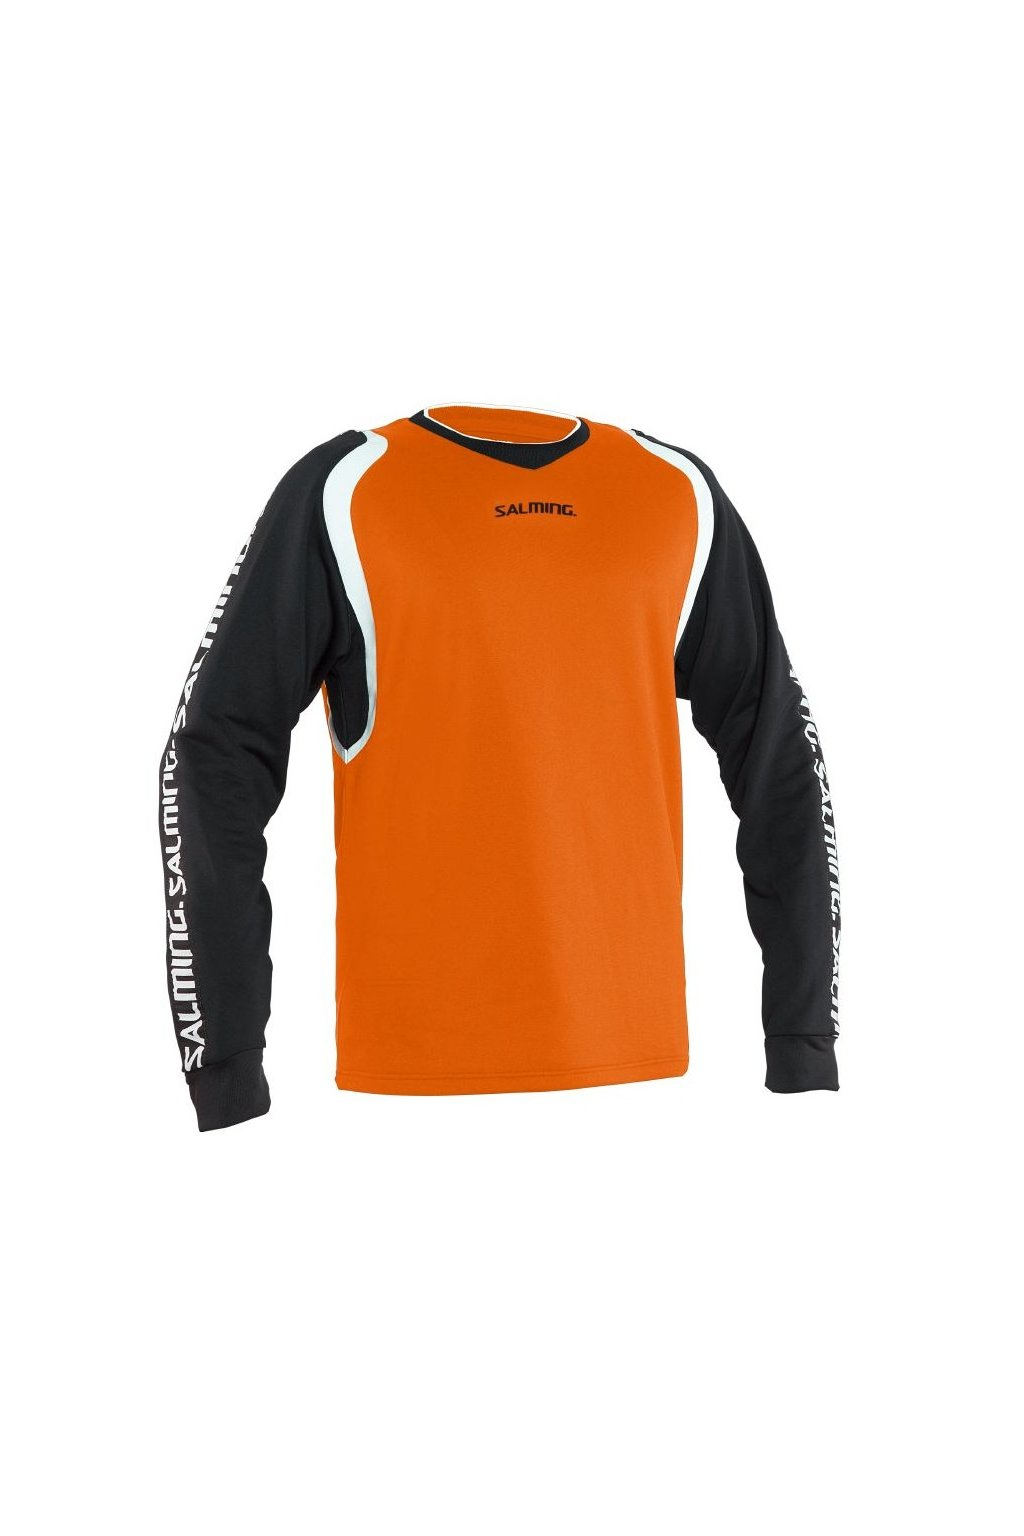 SALMING Agon LS Jersey Orange